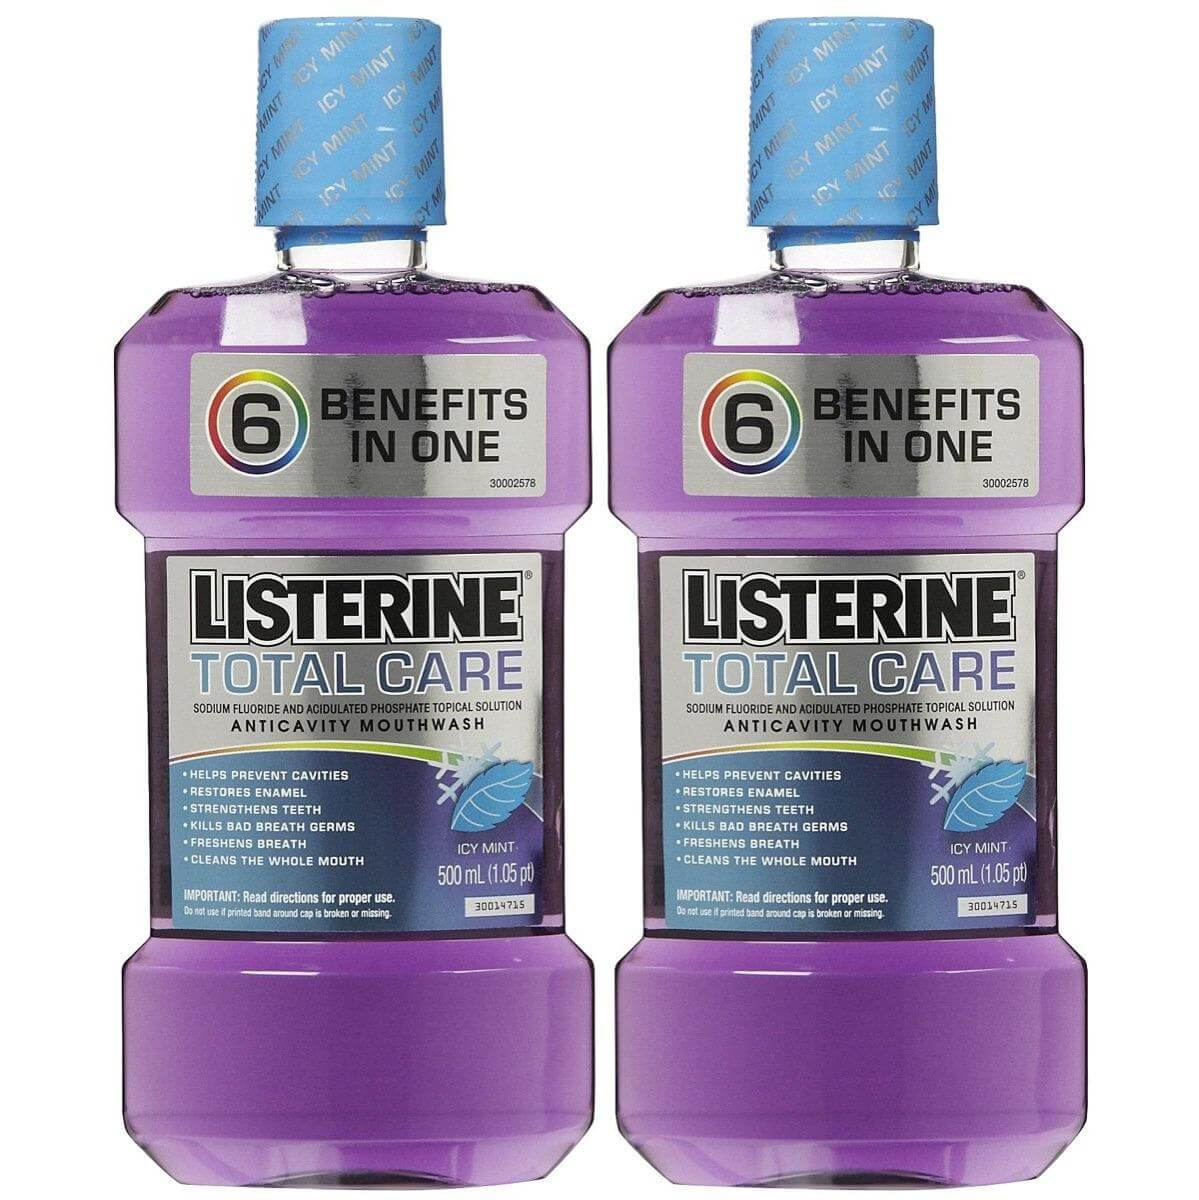 Listerine Total Care 6 Οφέλη για Ολοκληρωμένη Στοματική Υγιεινή 2 x 500ml 1+1 Δώρο